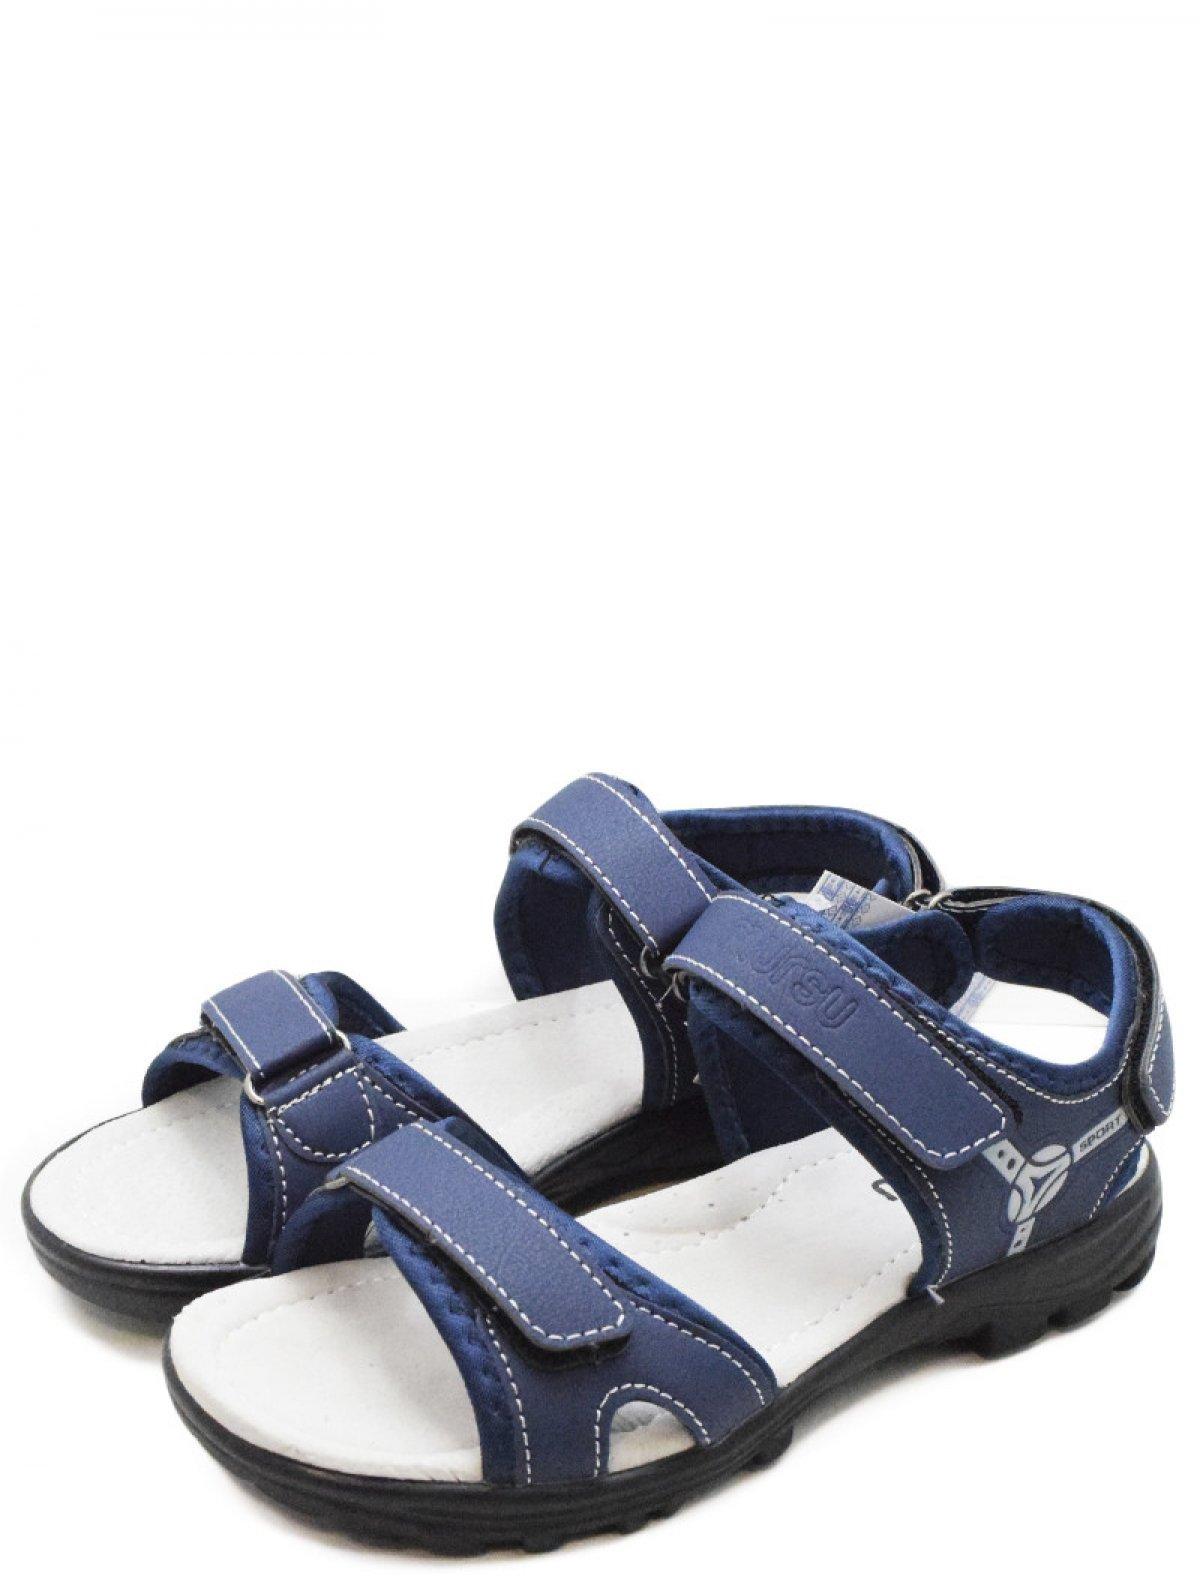 Mursu 203247 сандали для мальчика